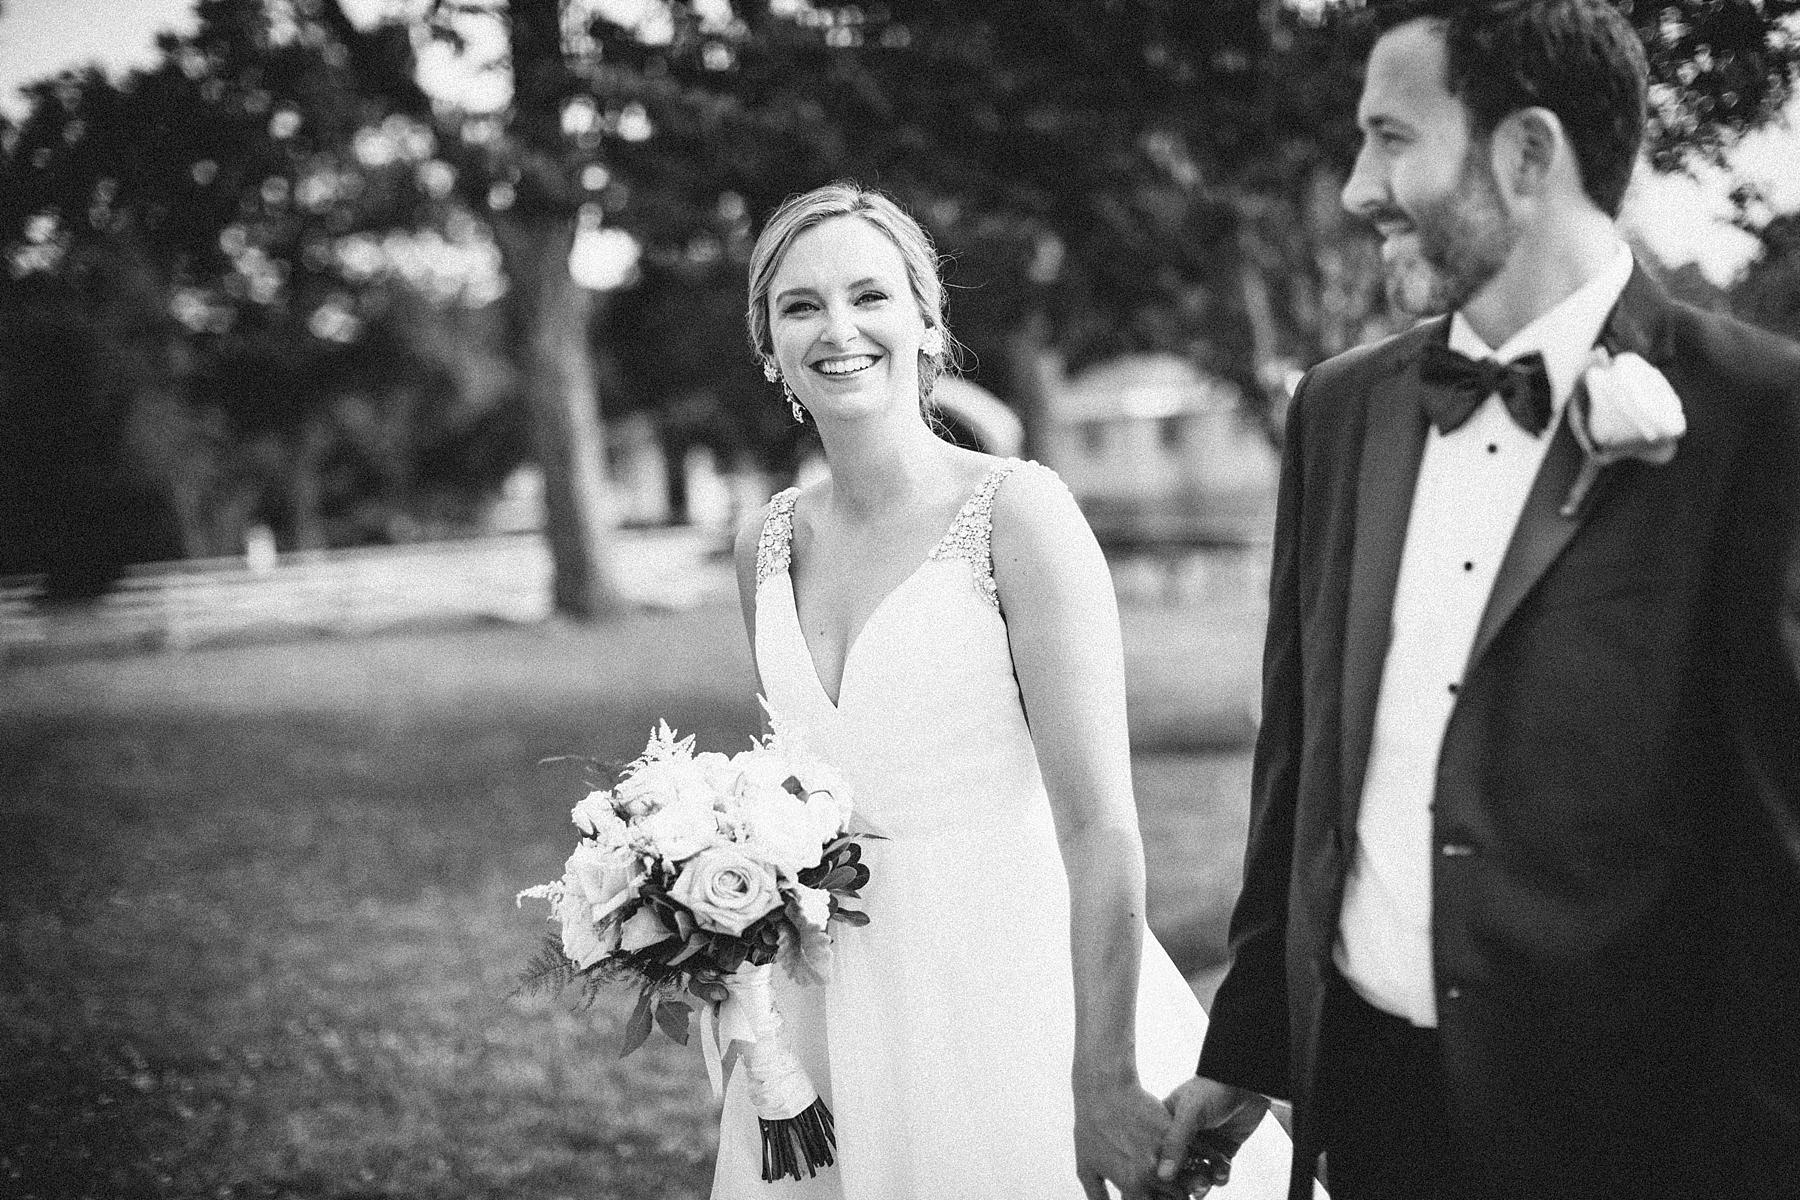 shadow_brook_nj_wedding_photographer_monmouth_county_0019.jpg